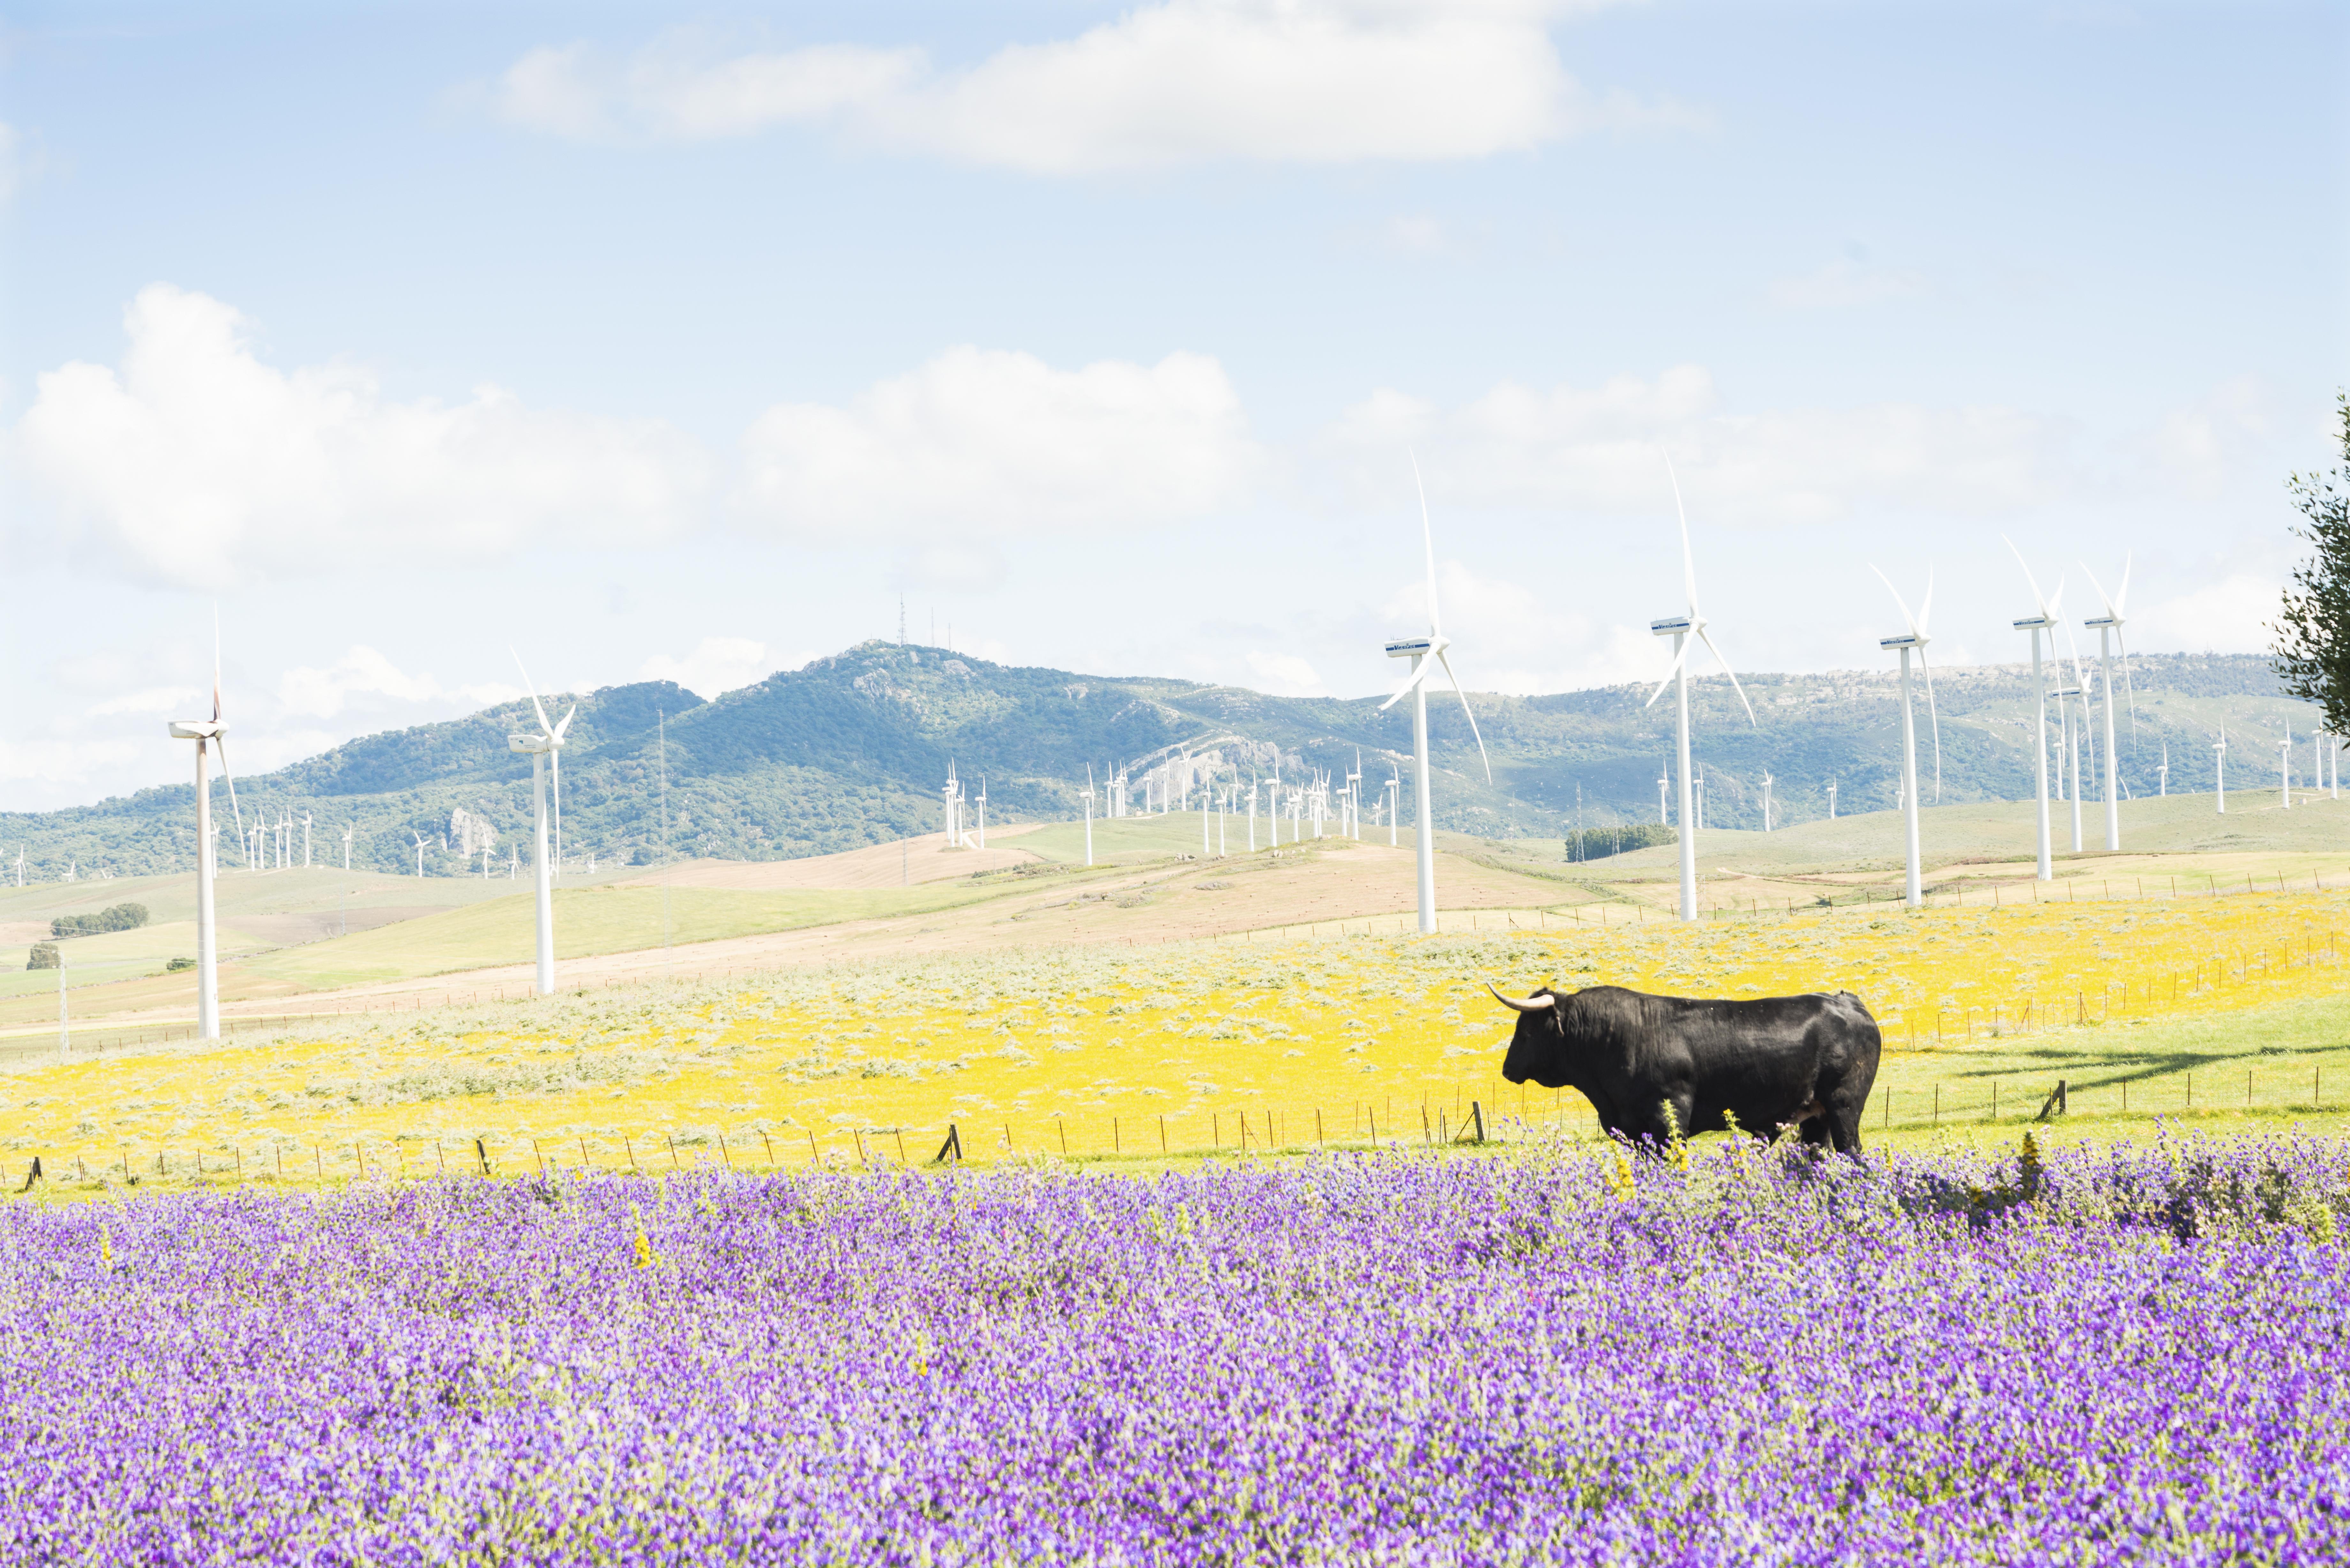 2010: bullish or bearish for energy markets?